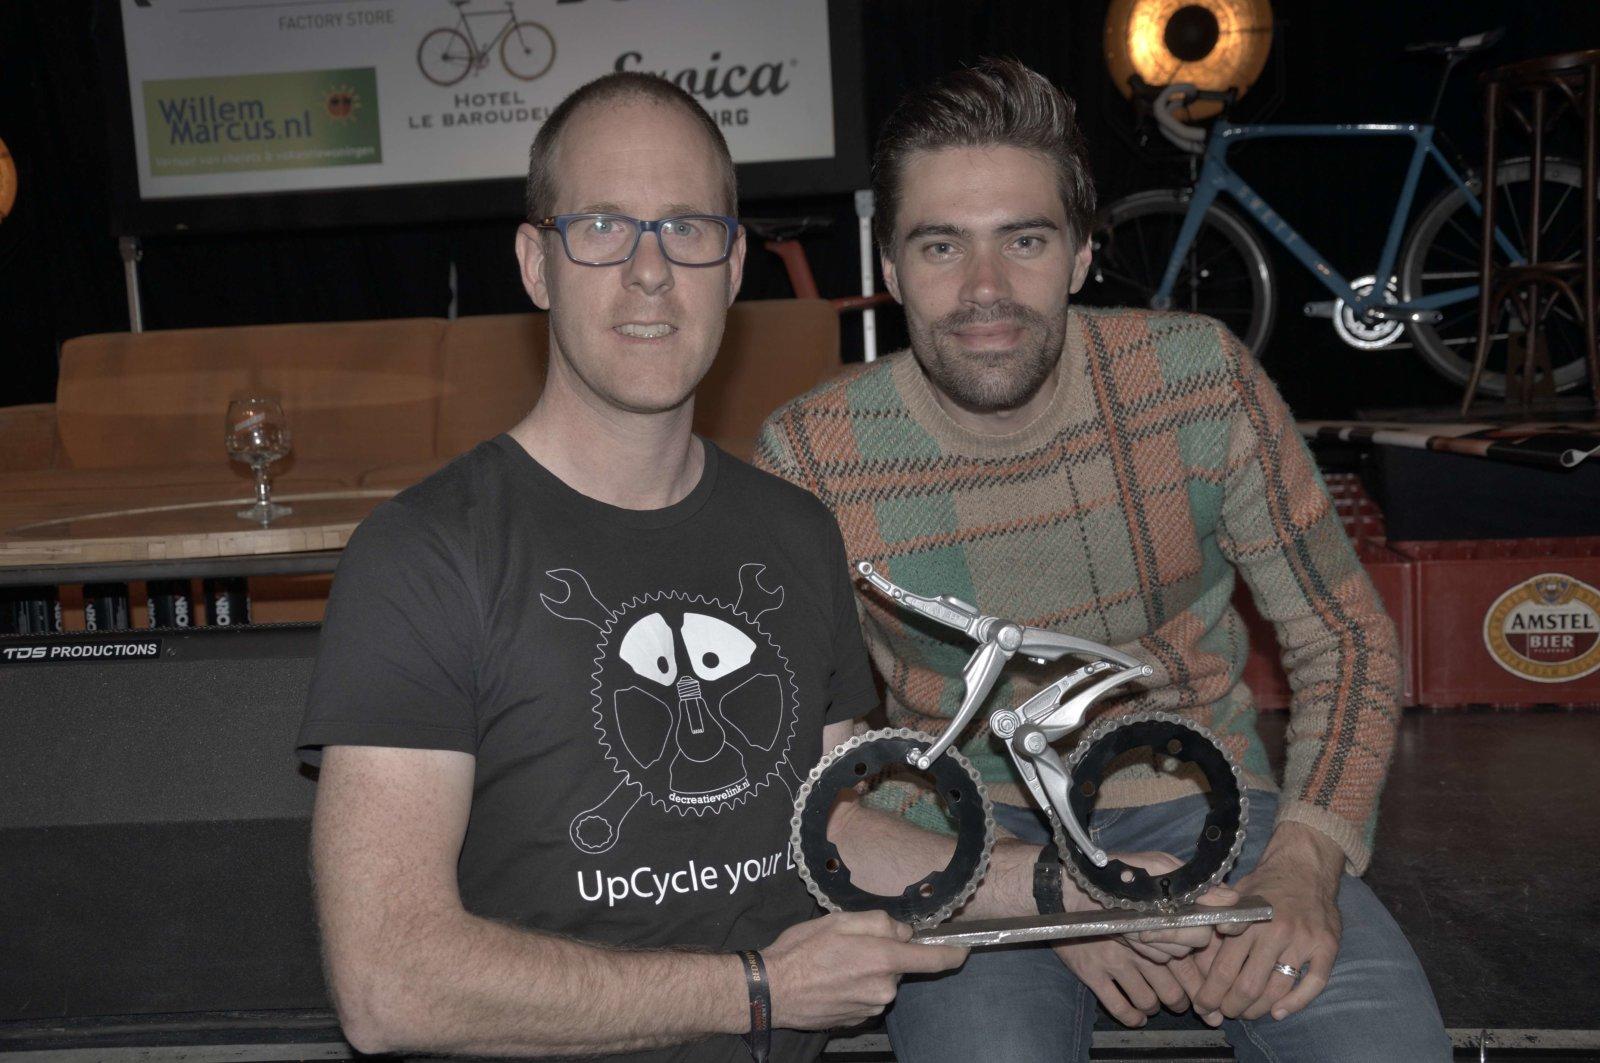 Oropa! Cyclist For Roel Klieverik Inspired By Tom Dumoulin Created By Decreatievelink